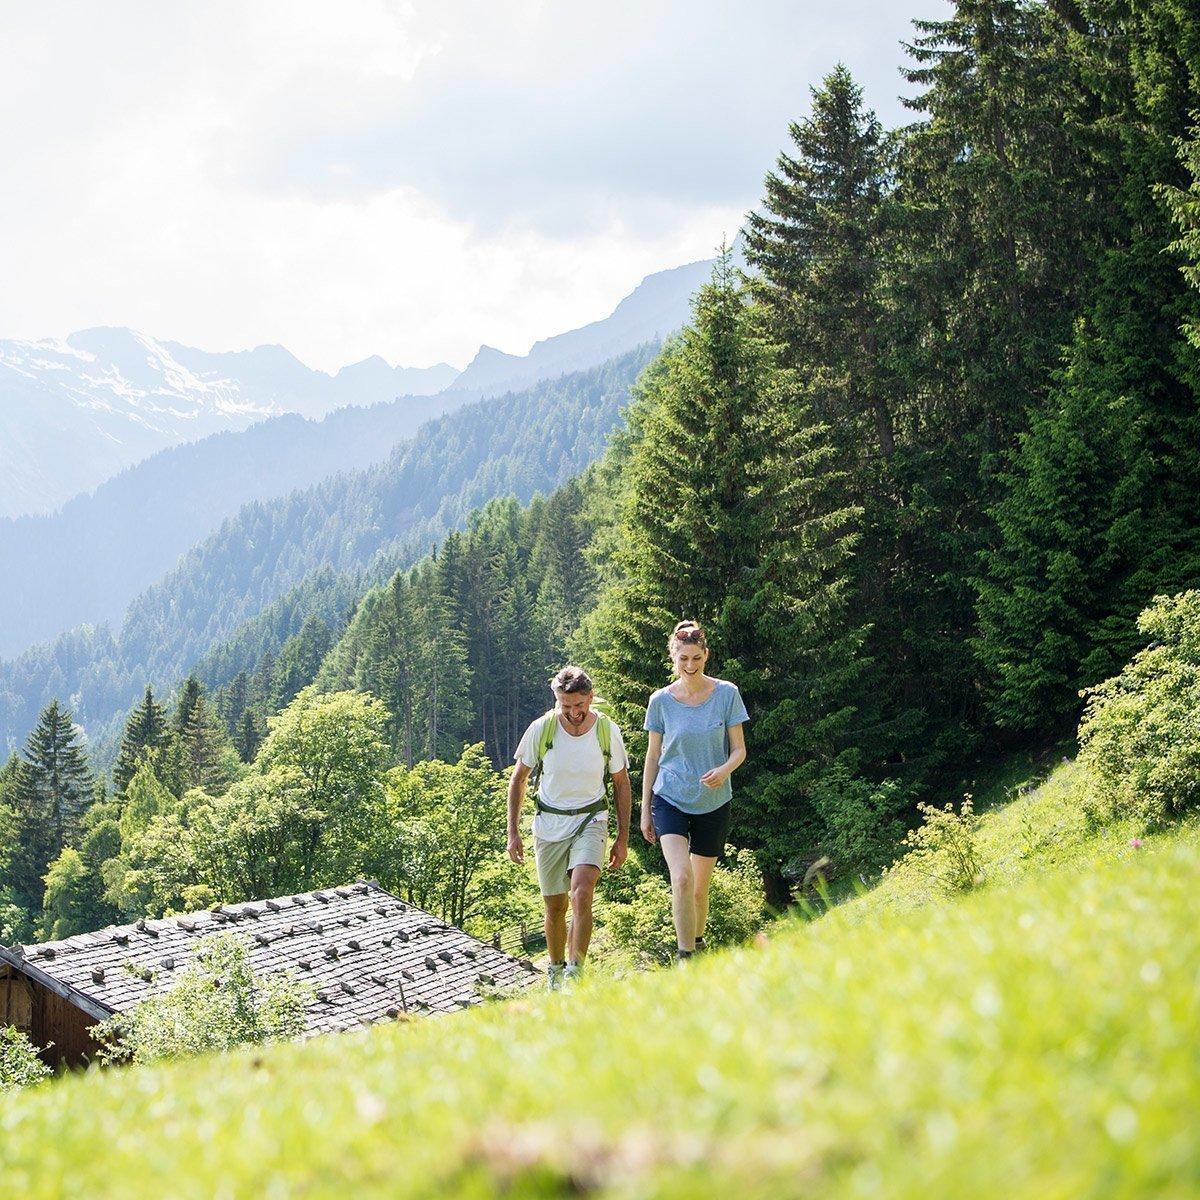 Wanderurlaub & Bergsteigen im Wipptal